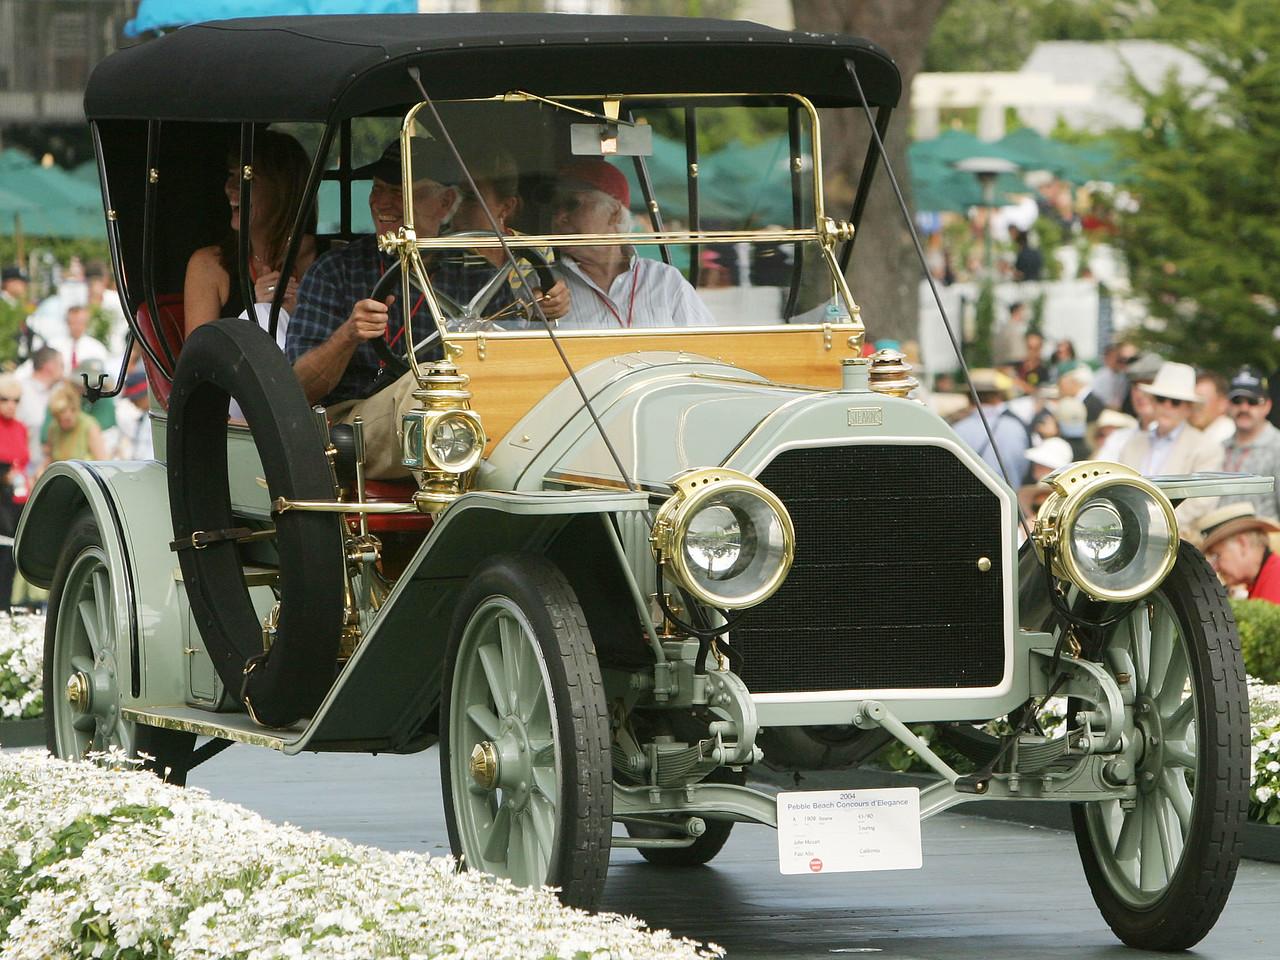 1908 Stearns 45/90 Touring.  Ansel Adams Trophy. John Mozart.